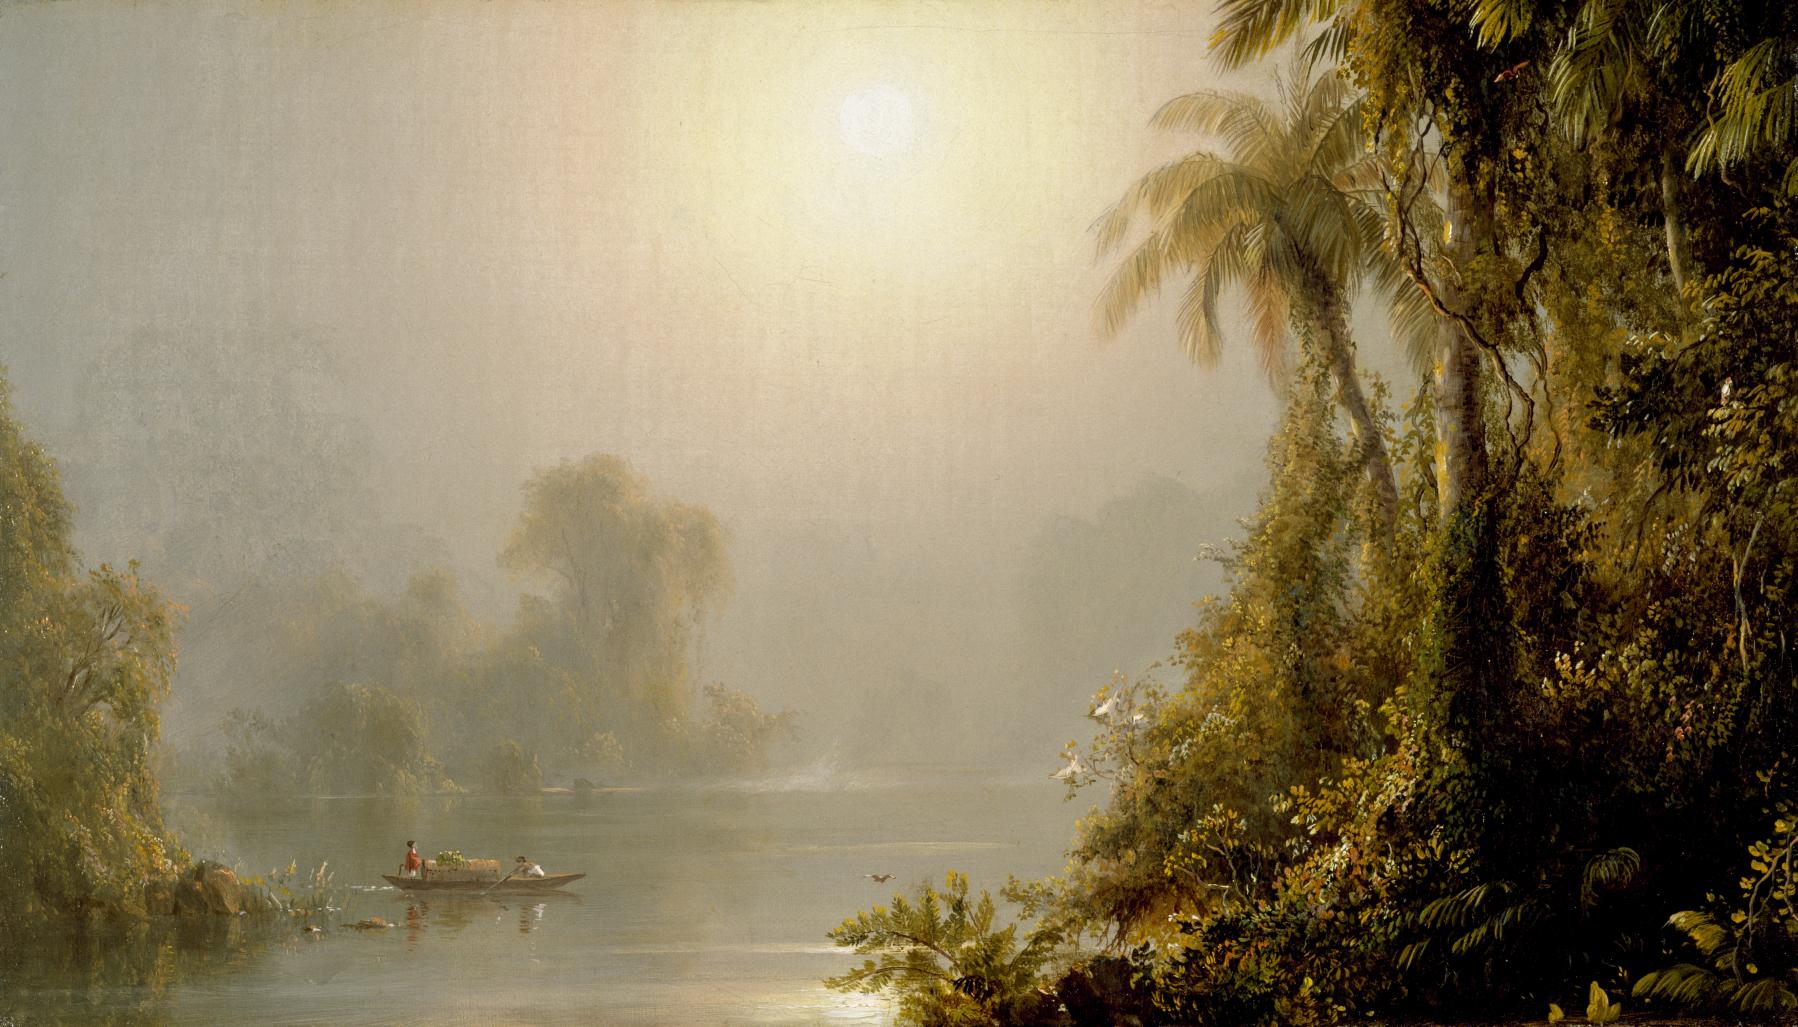 Frederick Edwin Church - Morning in the Tropics - Walters 37147.jpg